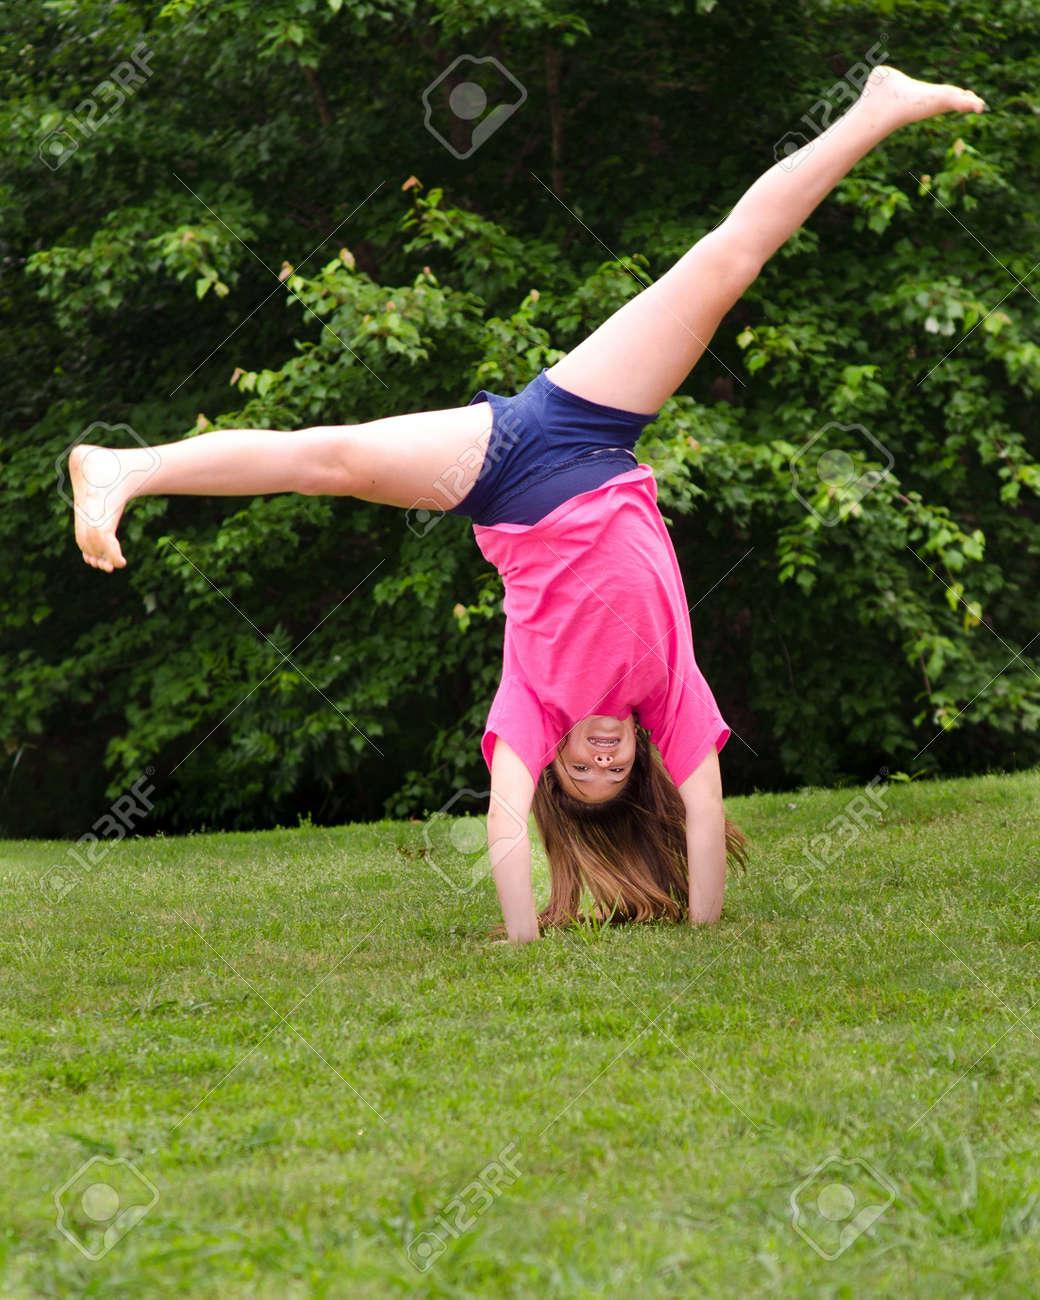 Young girl doing a cartwheel outdoors at park Stock Photo - 13387633